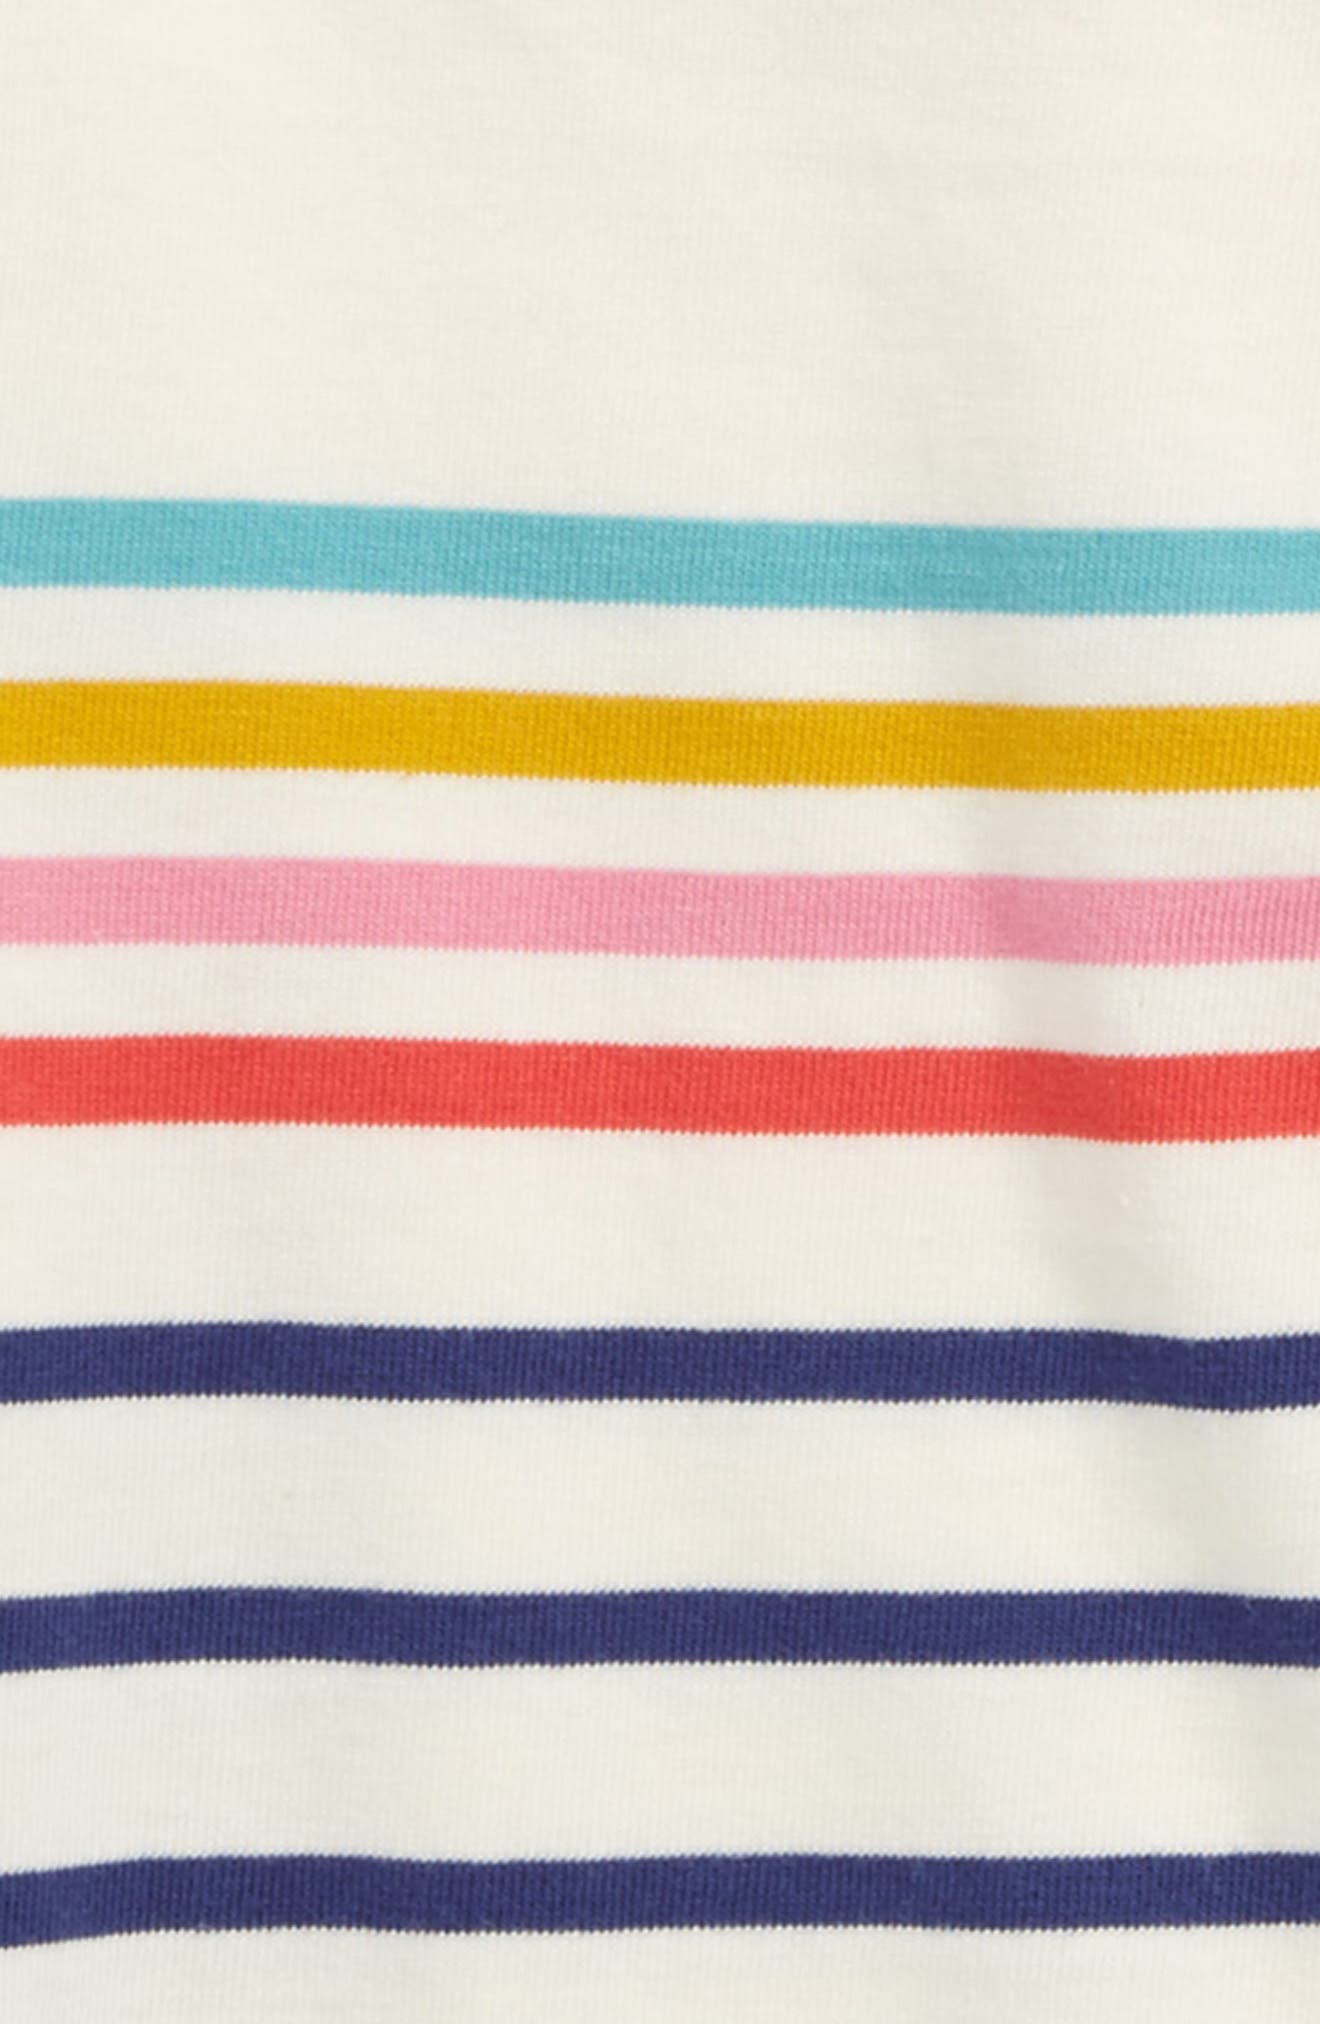 Colourfully Stripy Tee,                             Alternate thumbnail 2, color,                             Navy/ Ecru Rainbow